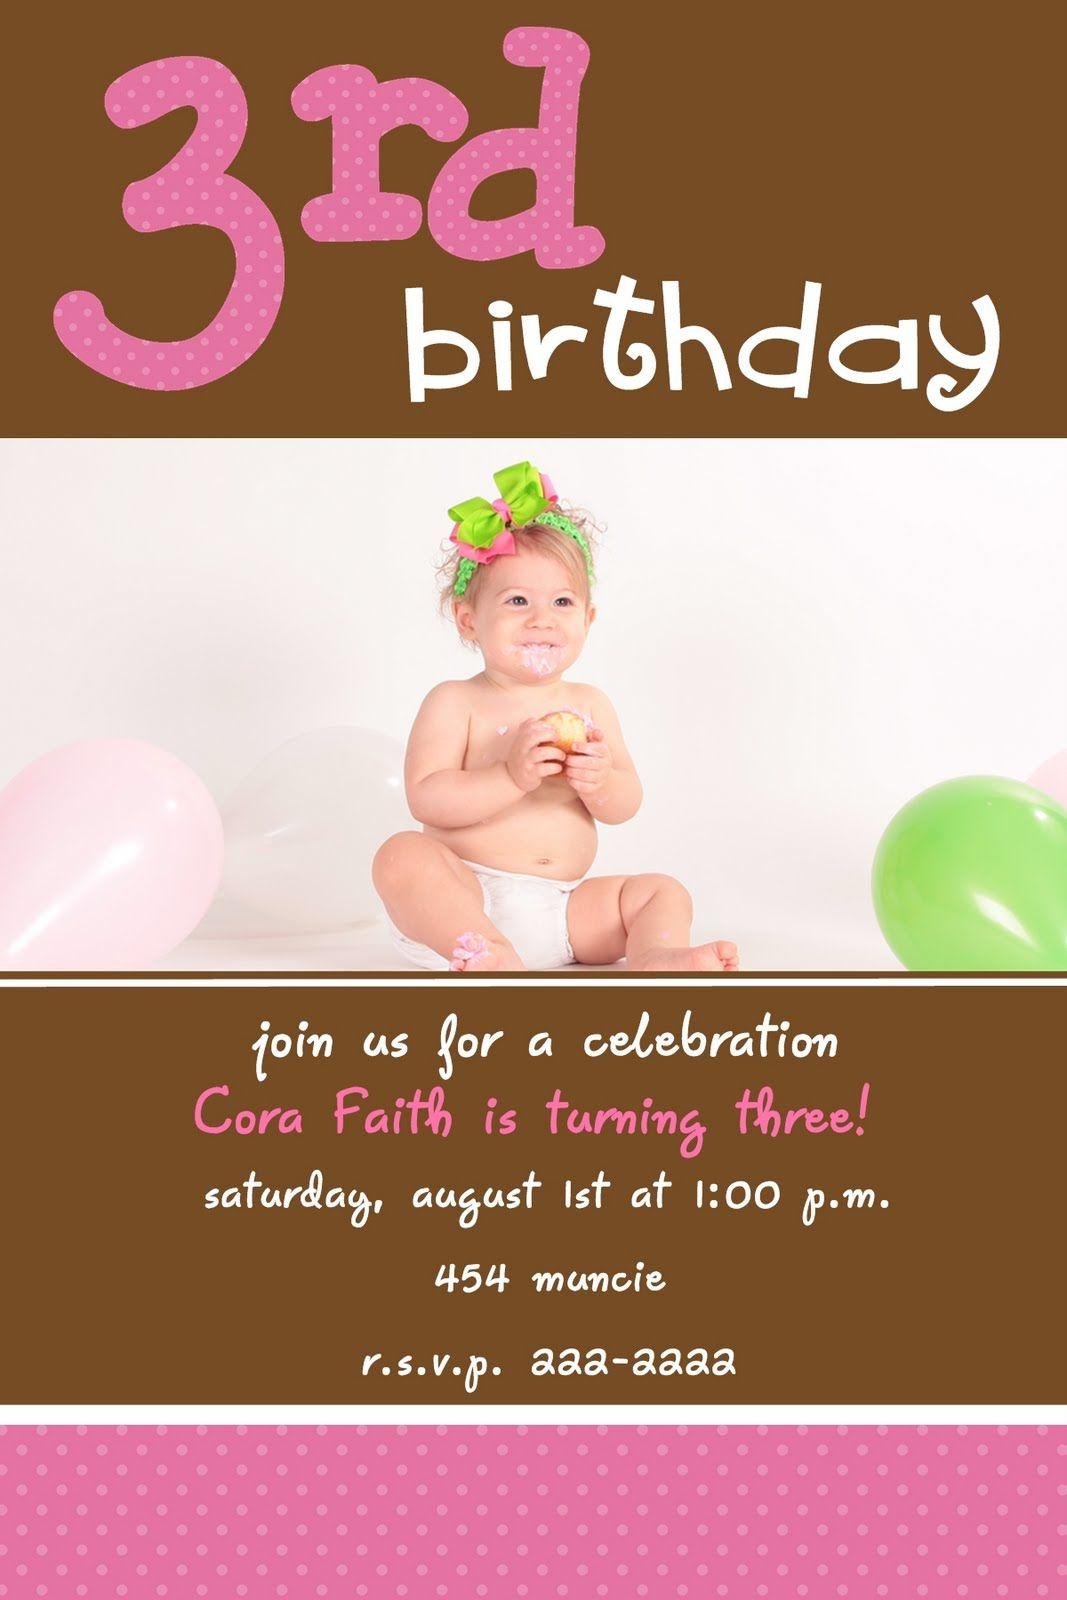 3rd birthday party invitation wording